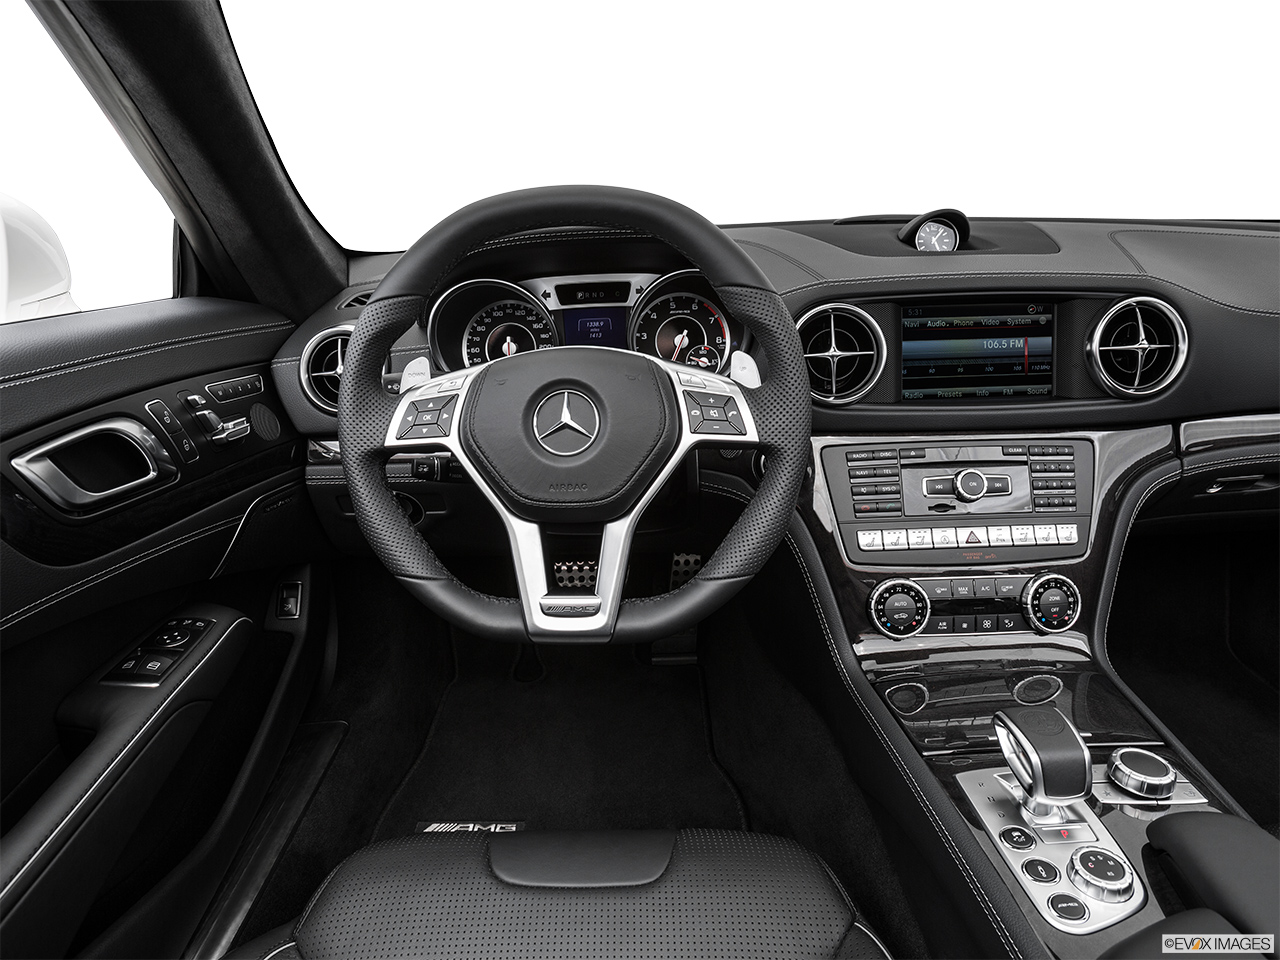 Car pictures list for mercedes benz sl 63 amg 2016 5 5 for Mercedes benz payment estimator